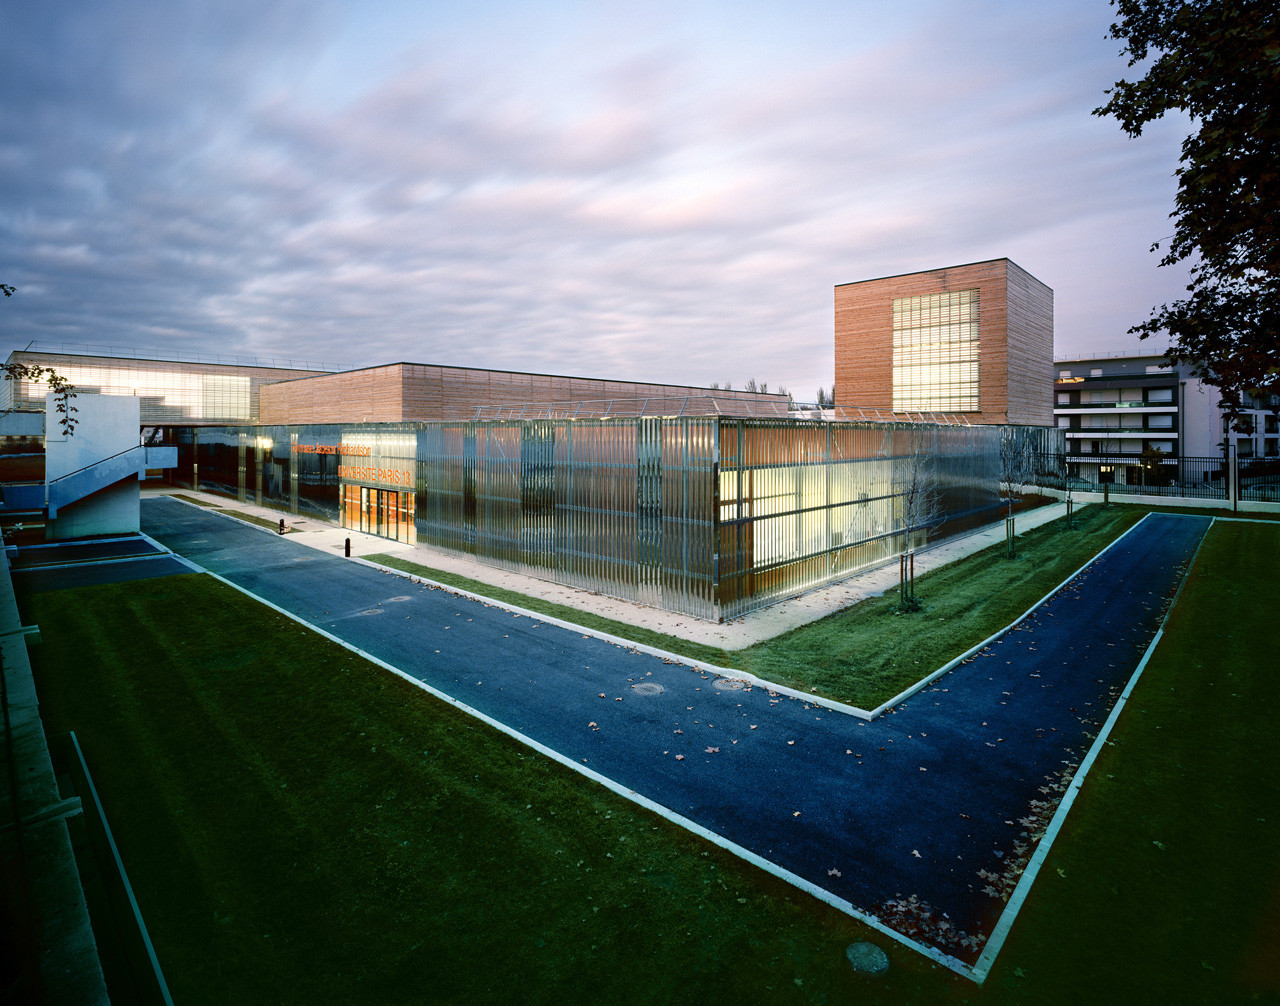 Polideportivo tag plataforma arquitectura for Arquitectura definicion